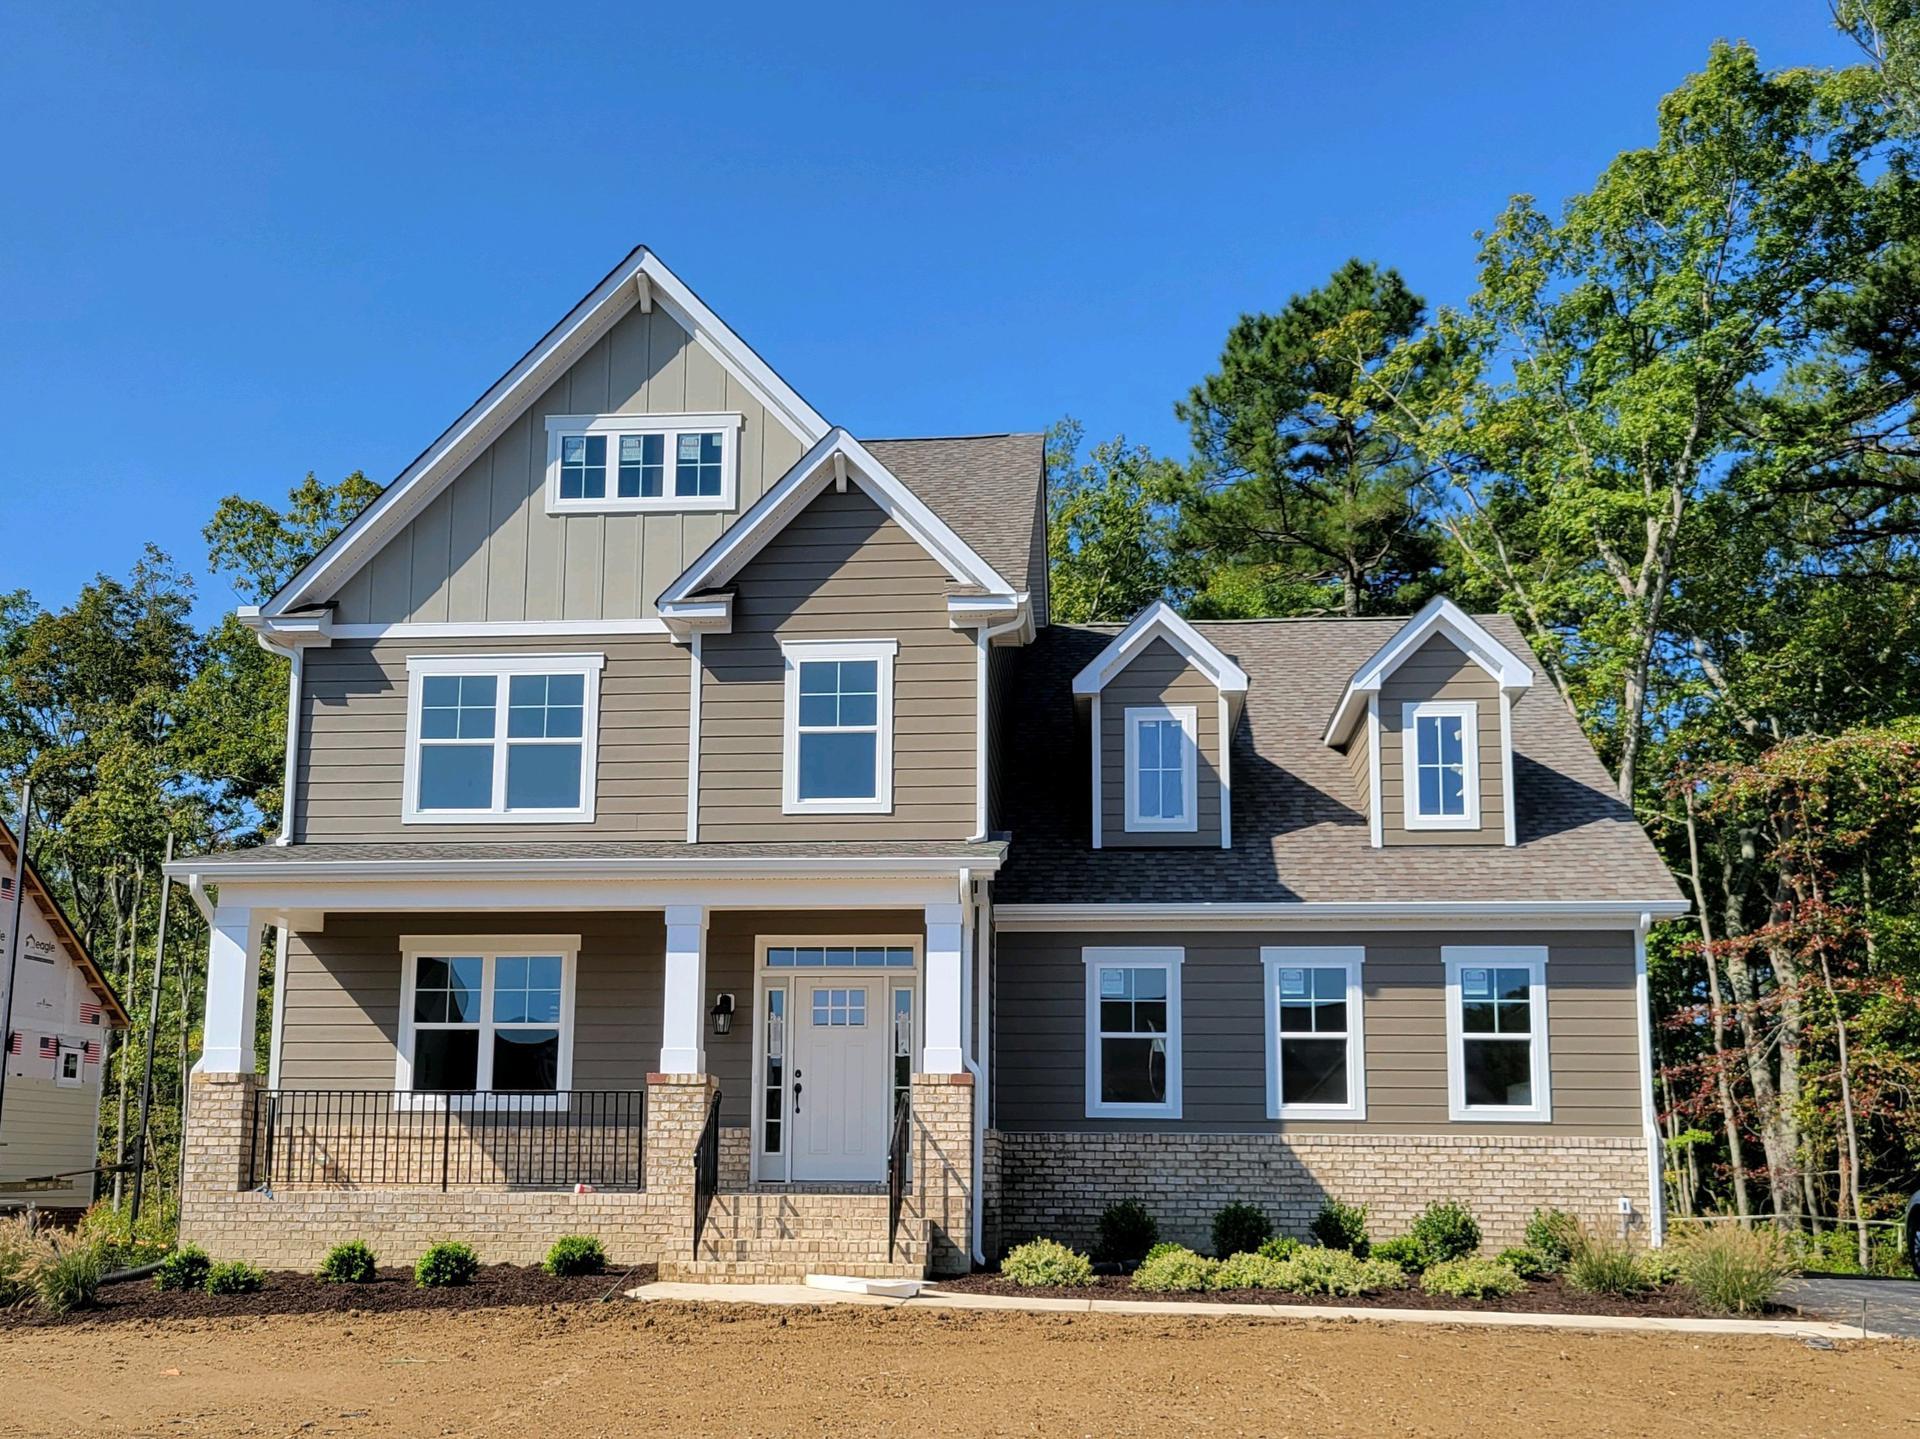 12305 Kilbourne Hill Drive, Ashland, VA 23005 Home for Sale